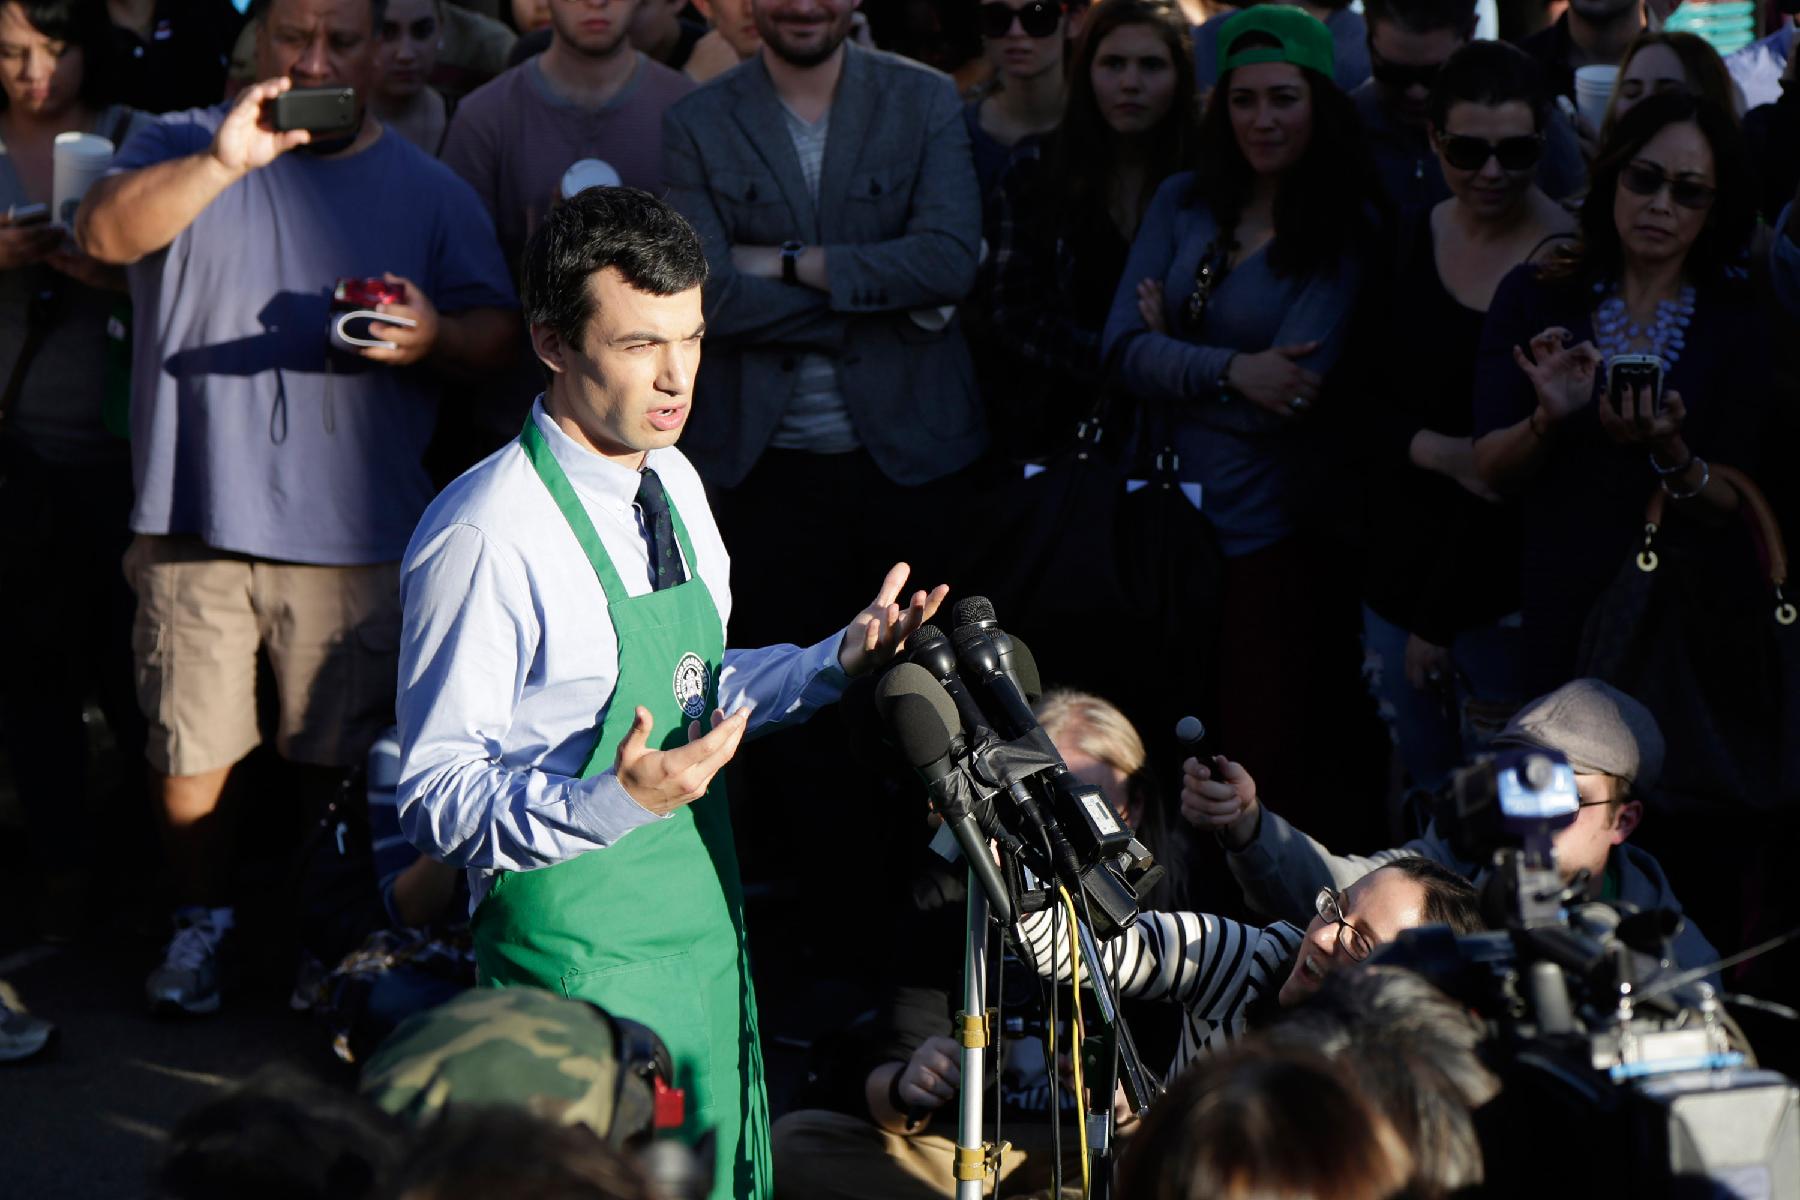 Nathan Fielder Talks 'Dumb Starbucks' And Pranking Instagram